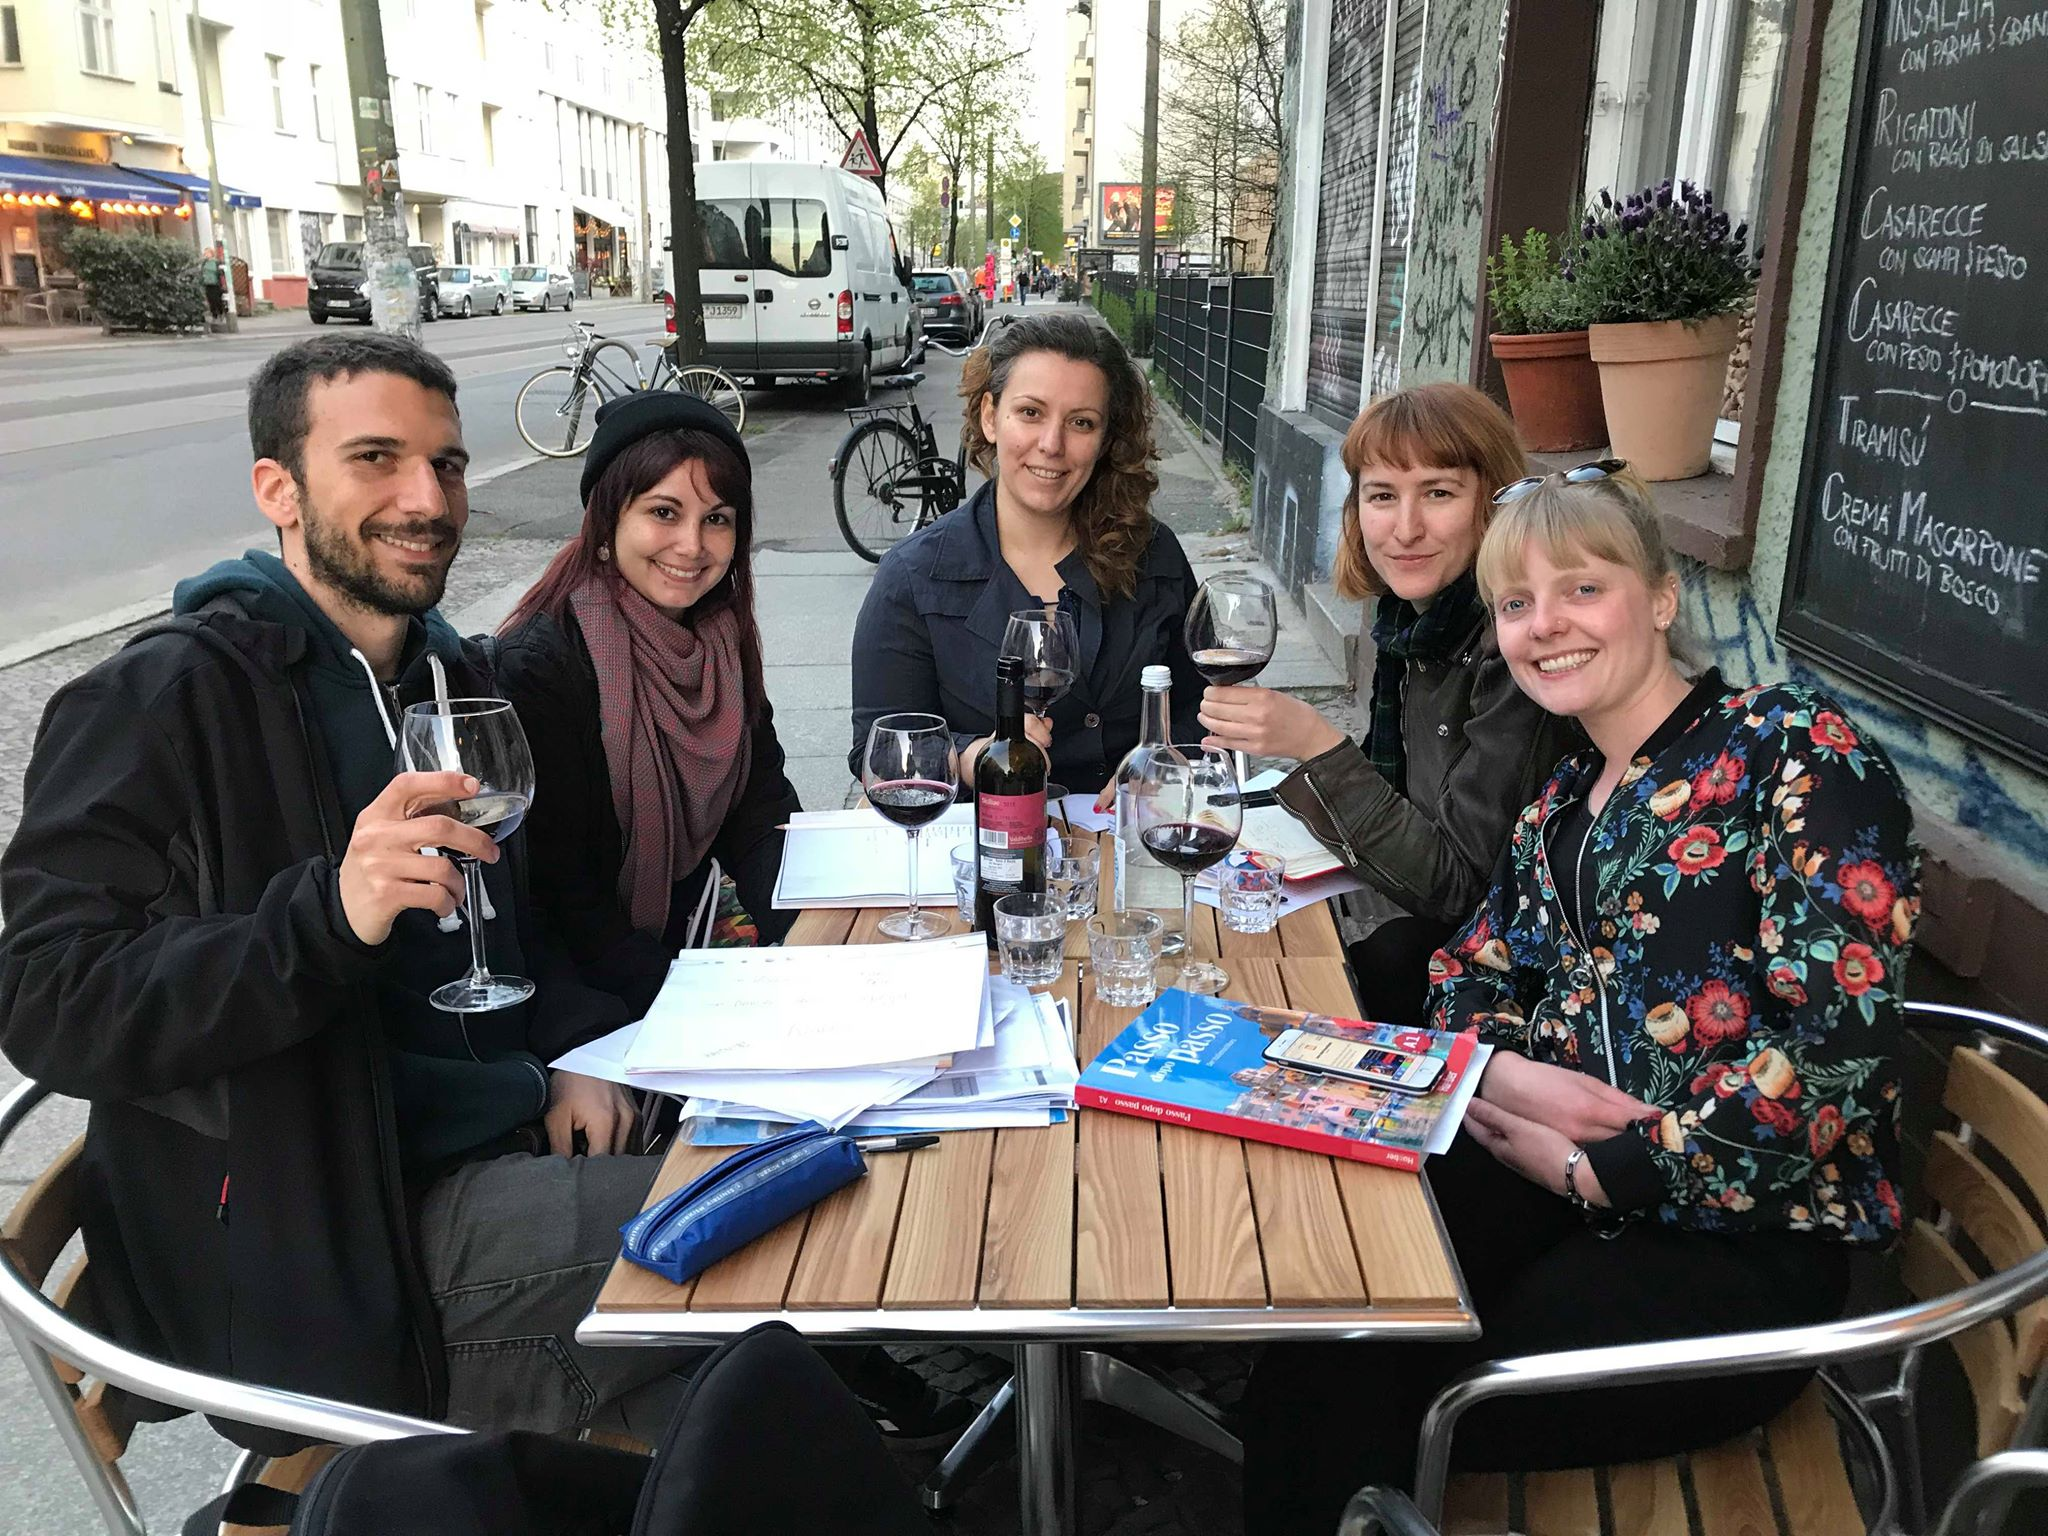 Italian classes in Berlin